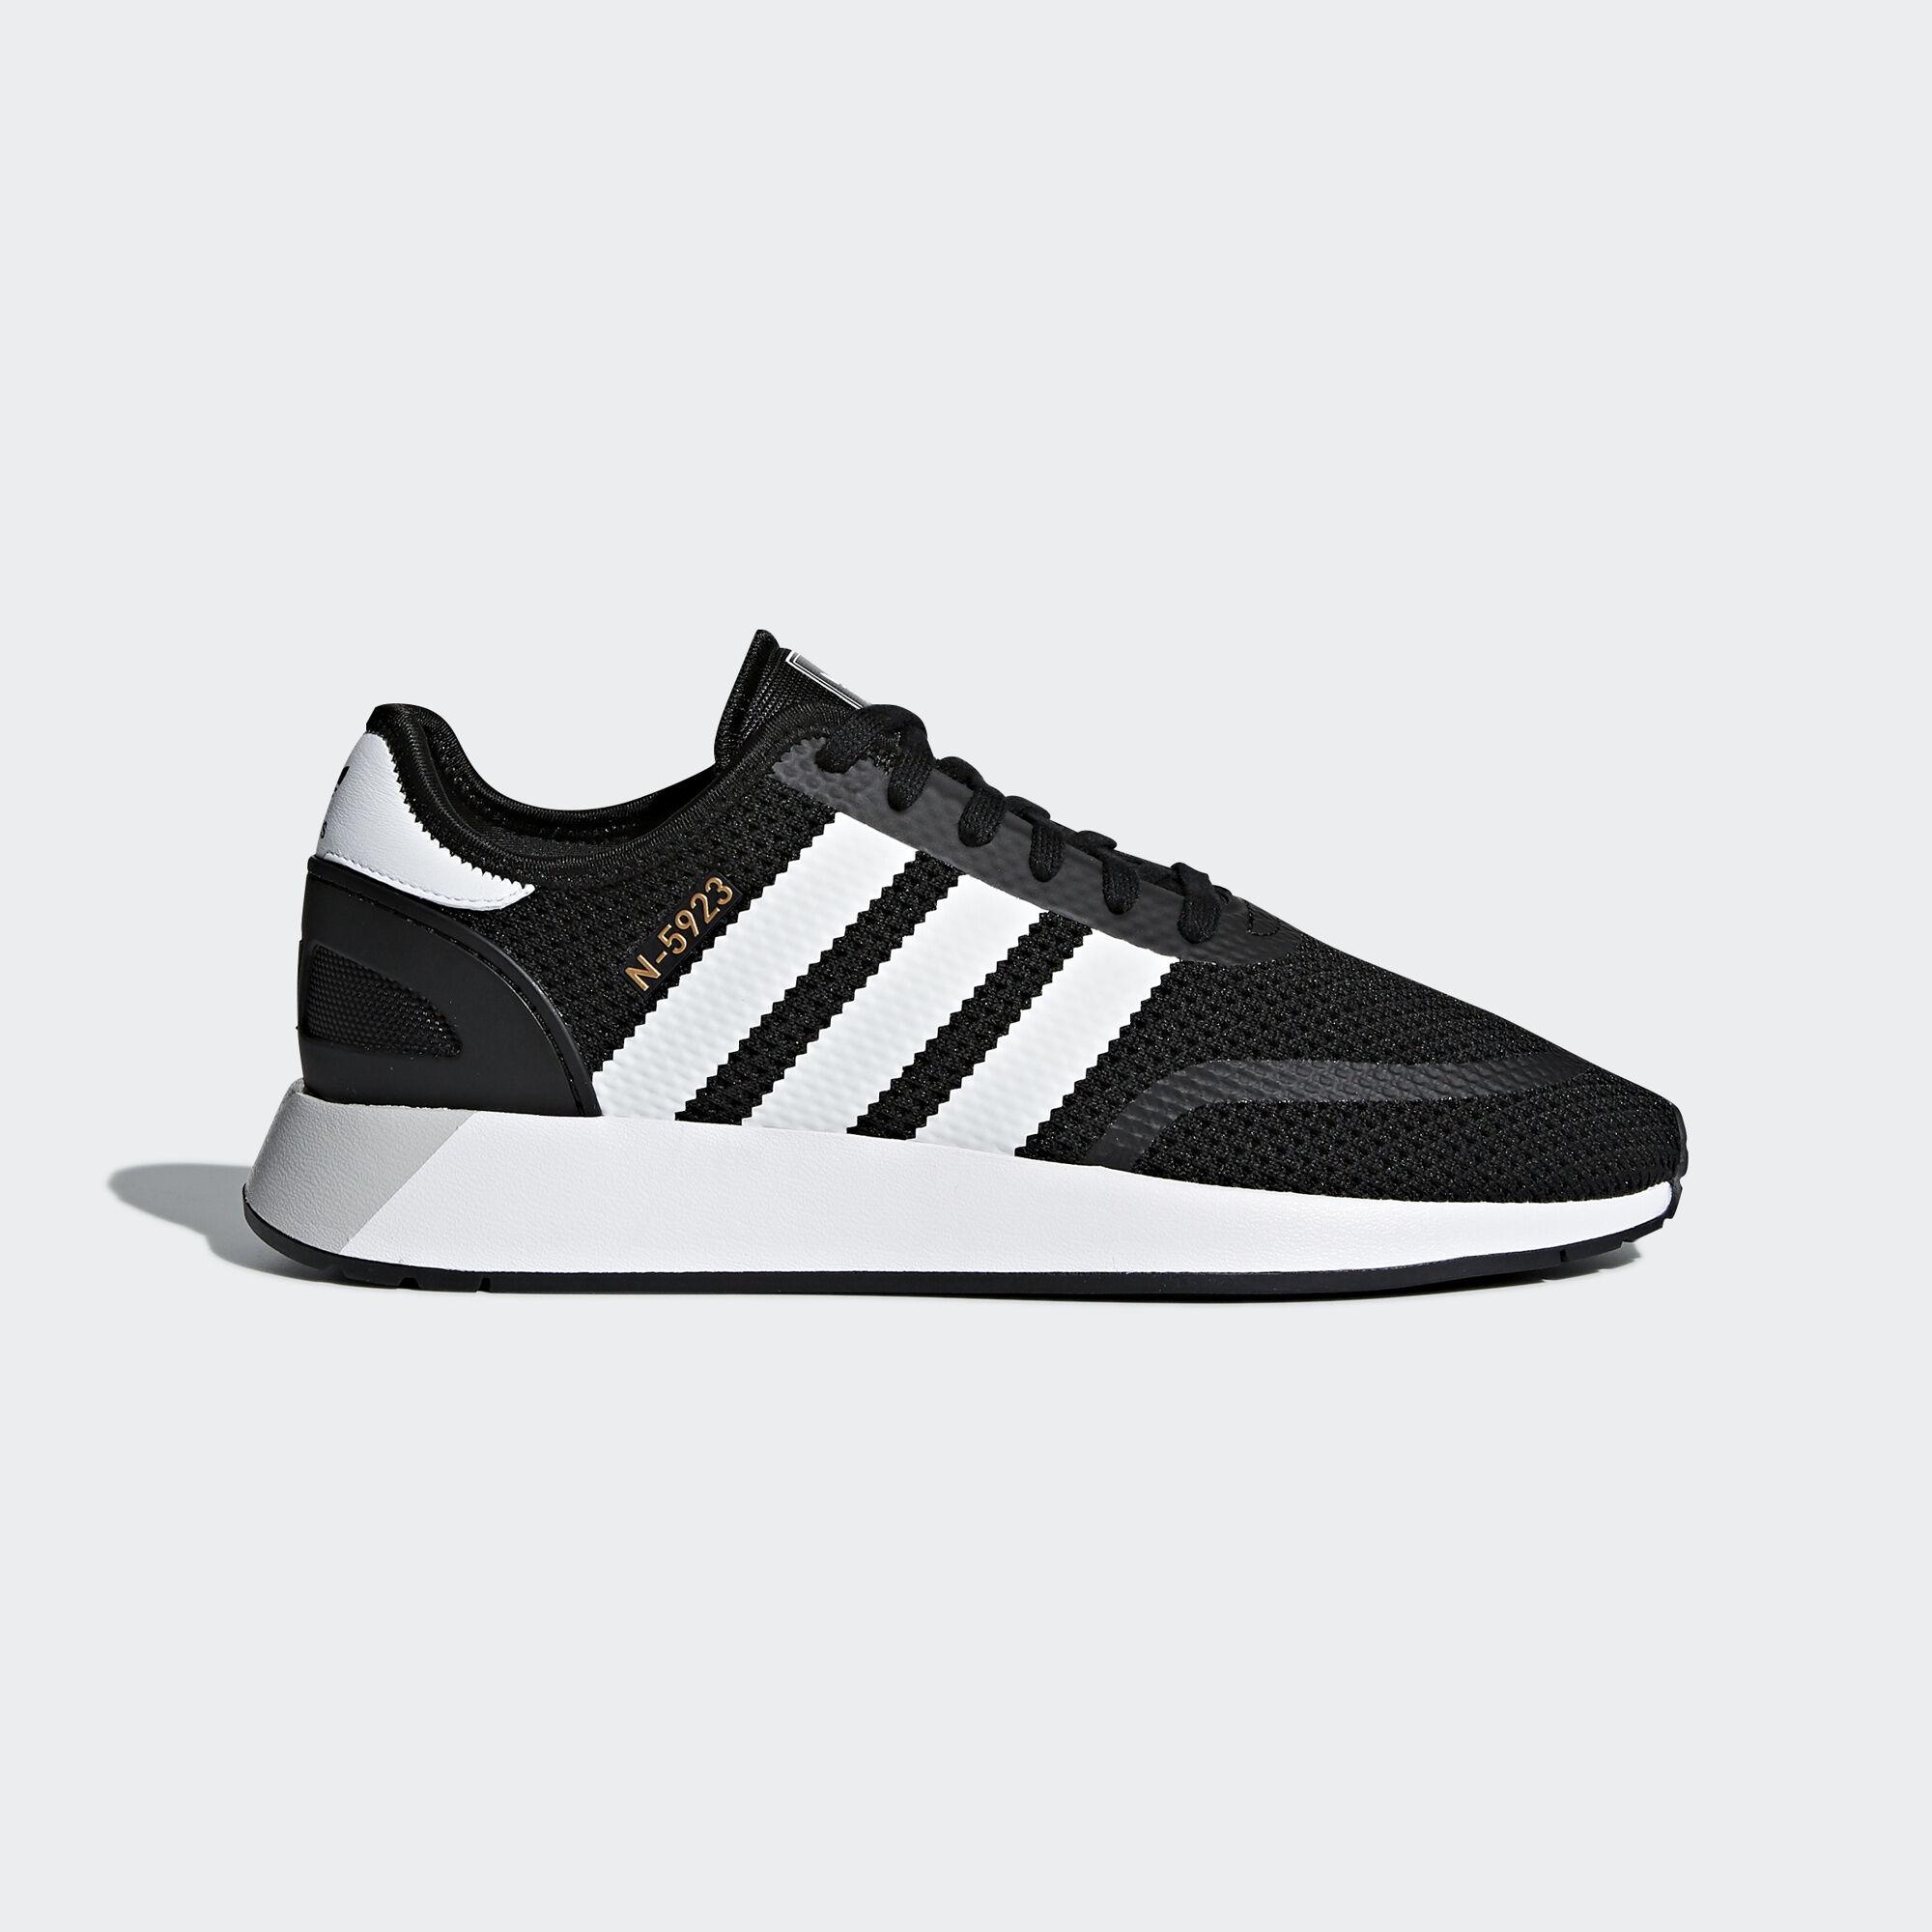 ADIDAS ORIGINALS N5923 70's INSPIRED RETRO CQ2337 CORE BLACK/FOOTWEAR WHITE/GREY